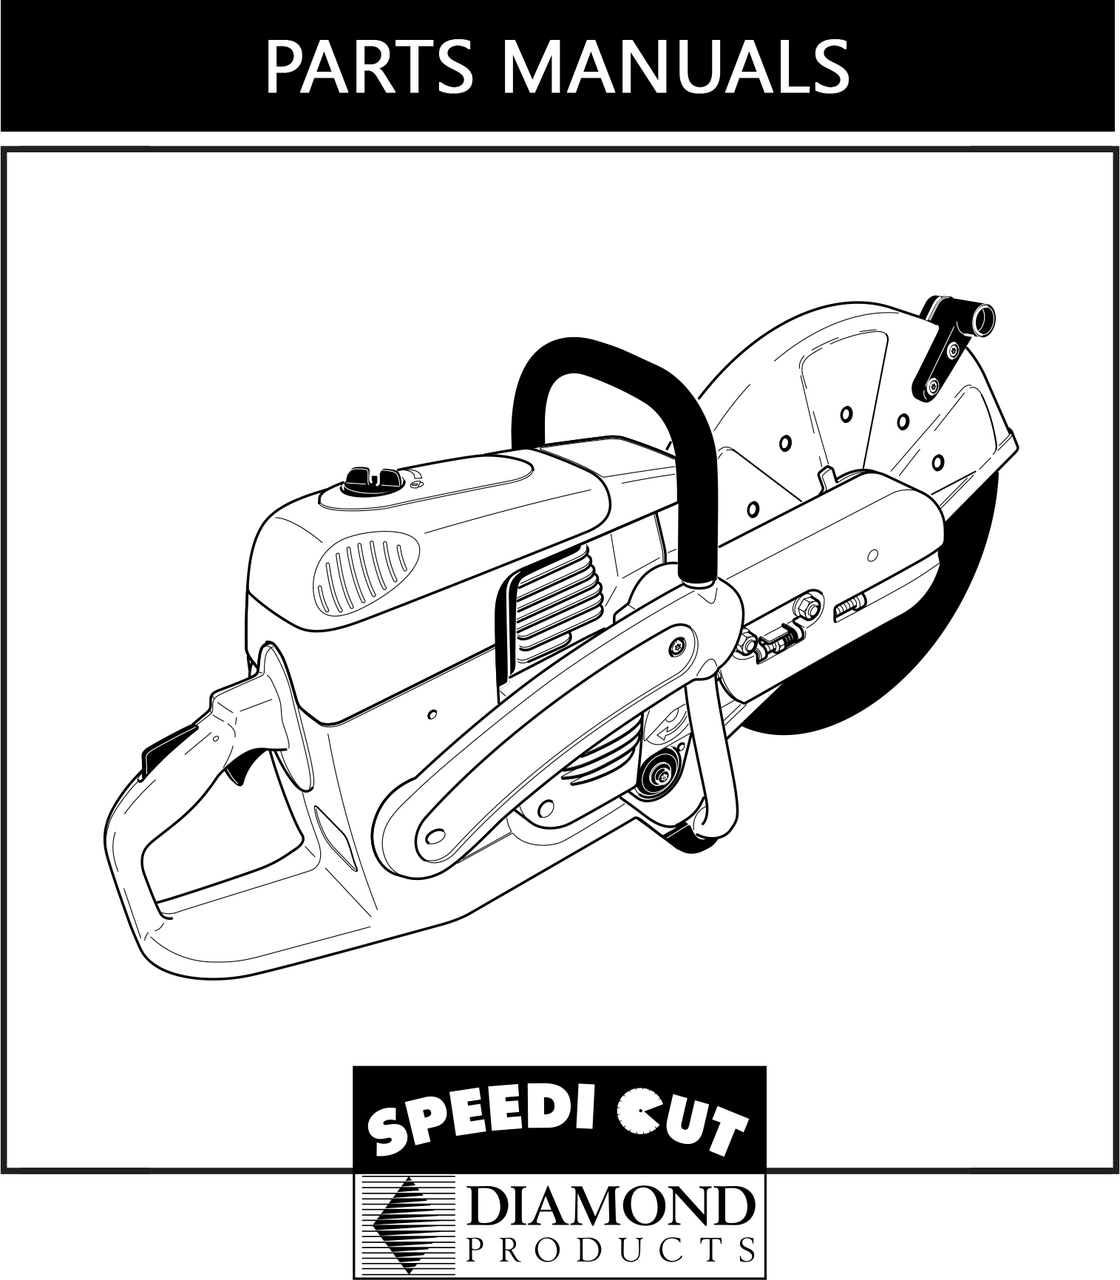 Speedicut drive belt 6060118 fits speedicut sc7312, sc7314 | ebay.